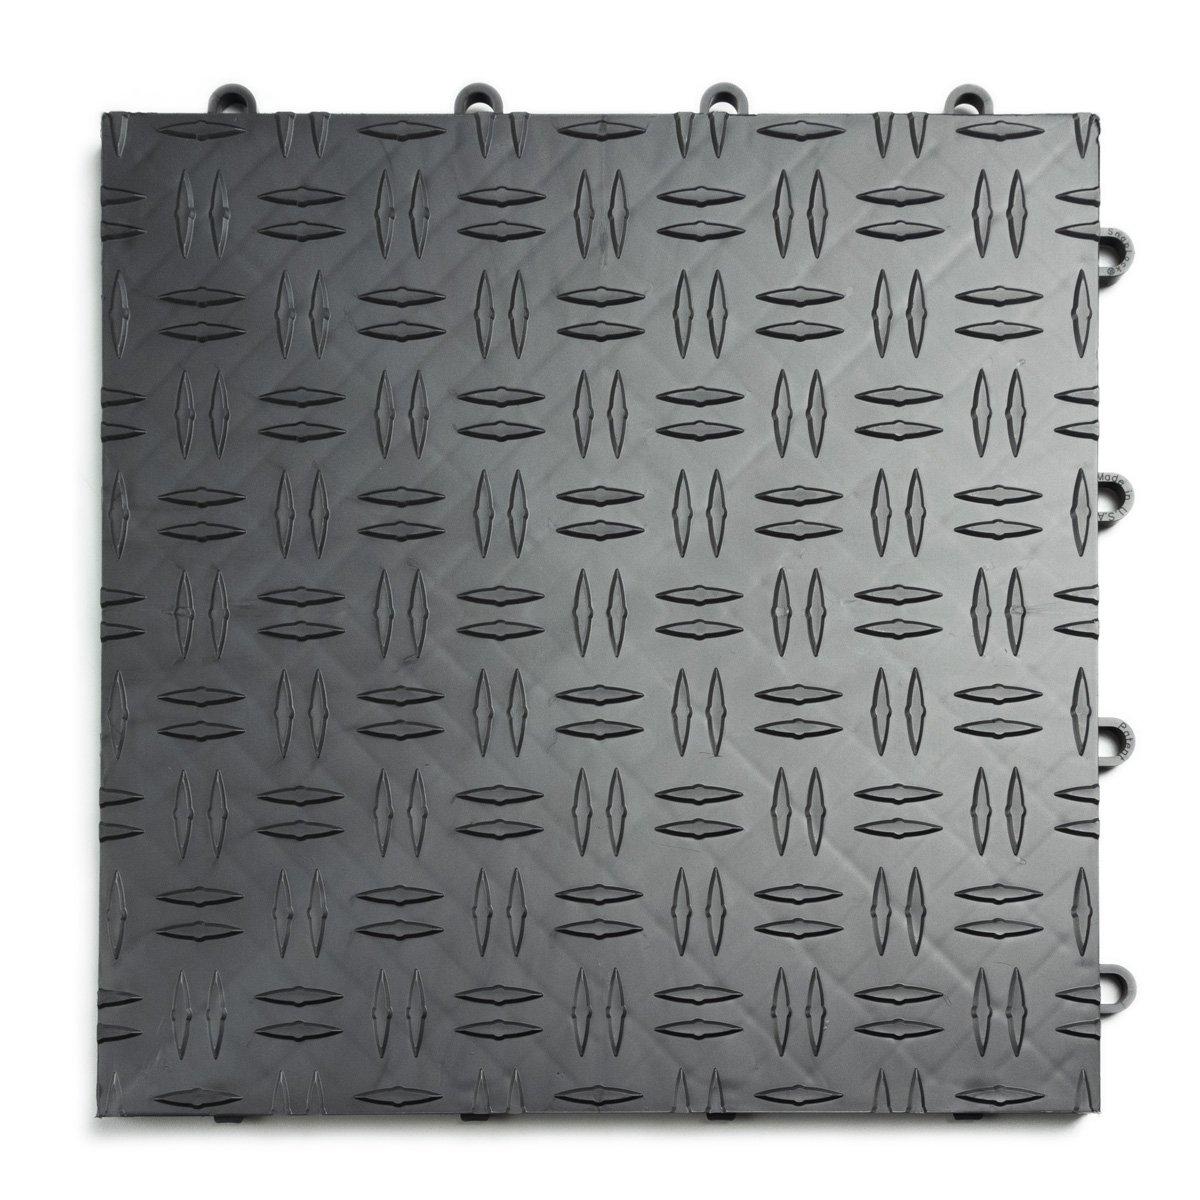 GarageTrac Diamond, Durable Interlocking Modular Garage Flooring Tile (48 Pack), Graphite by GarageTrac